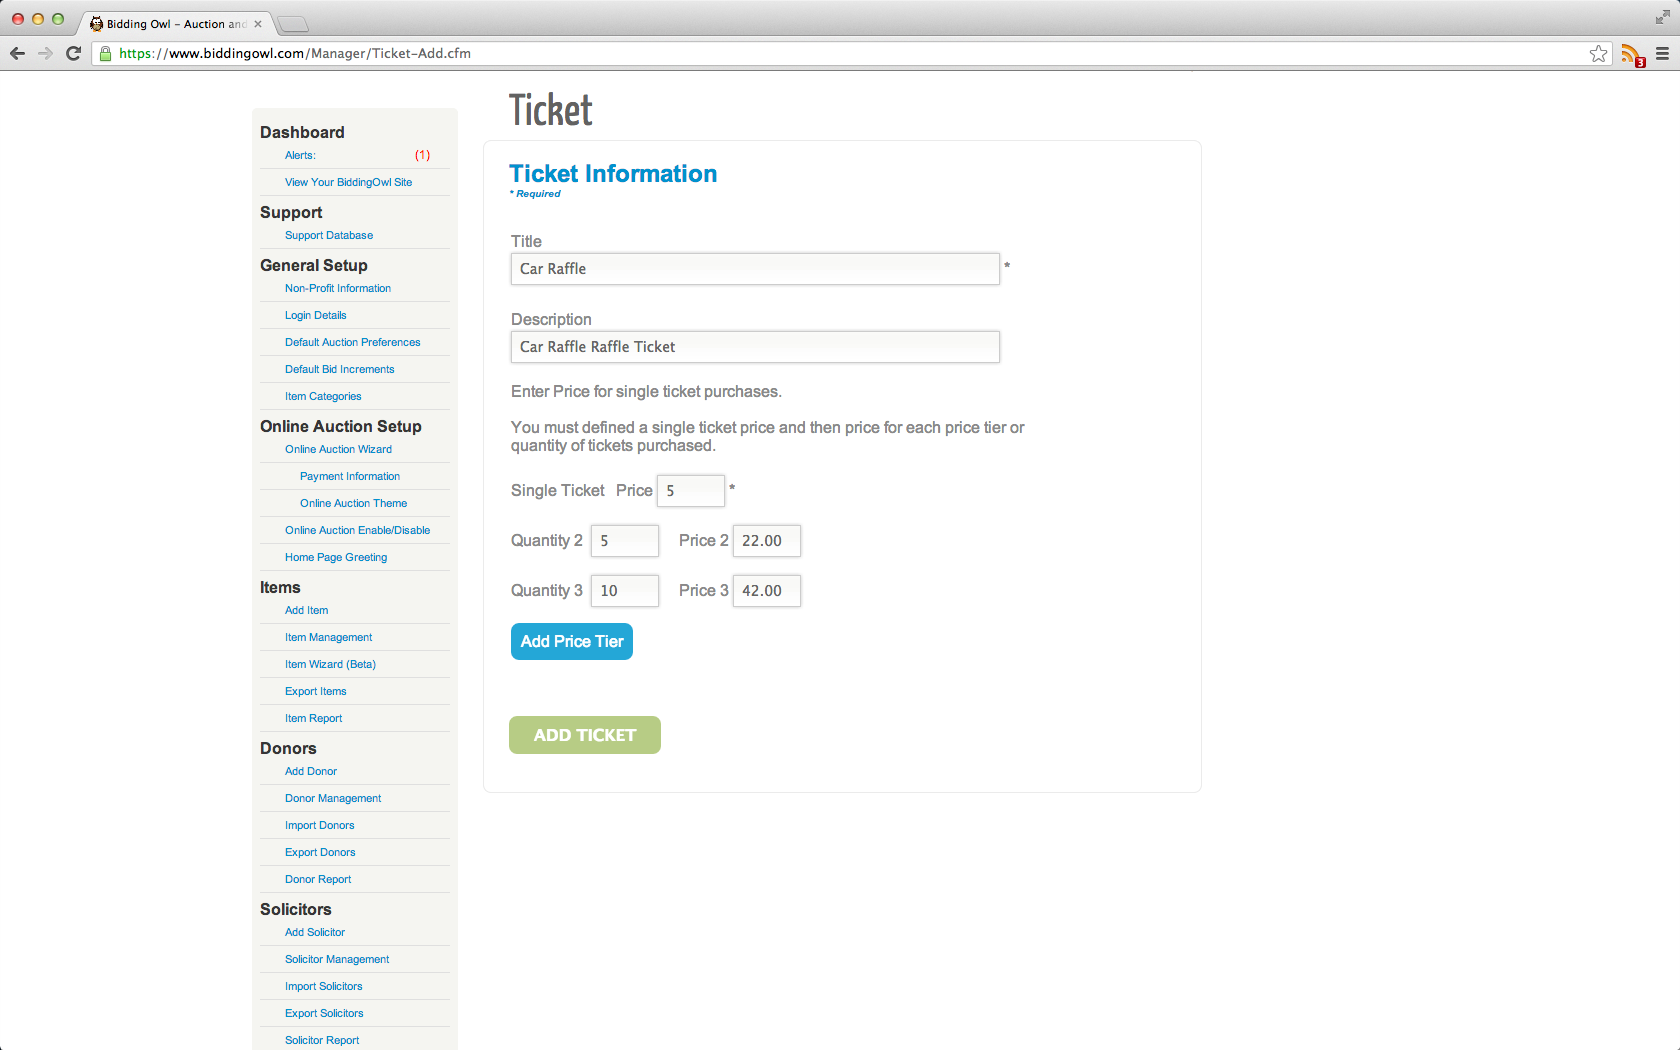 BiddingOwl ticket information